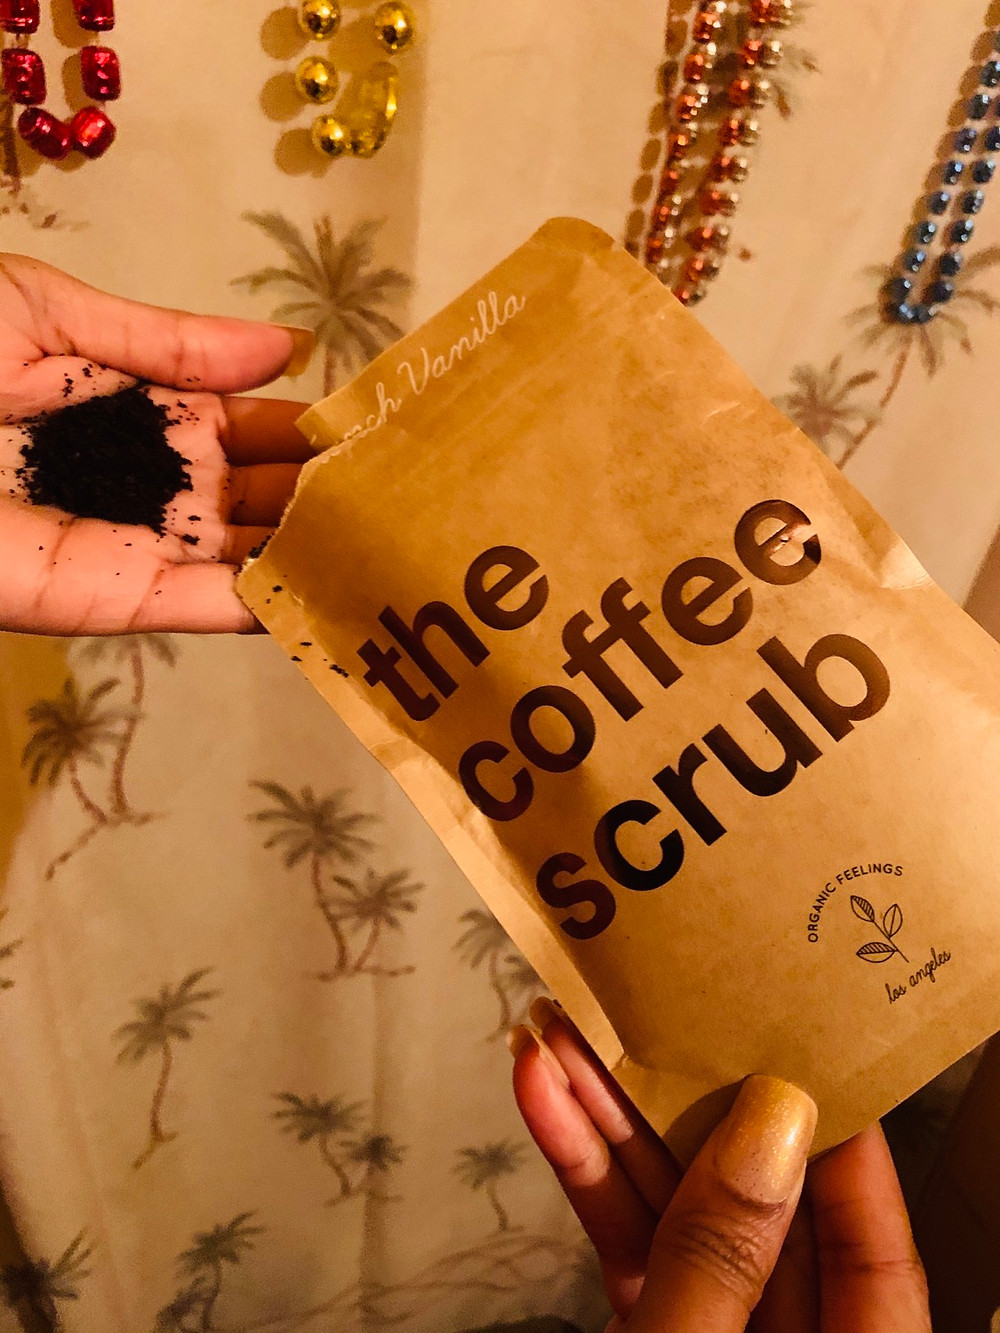 The Coffee Scrub